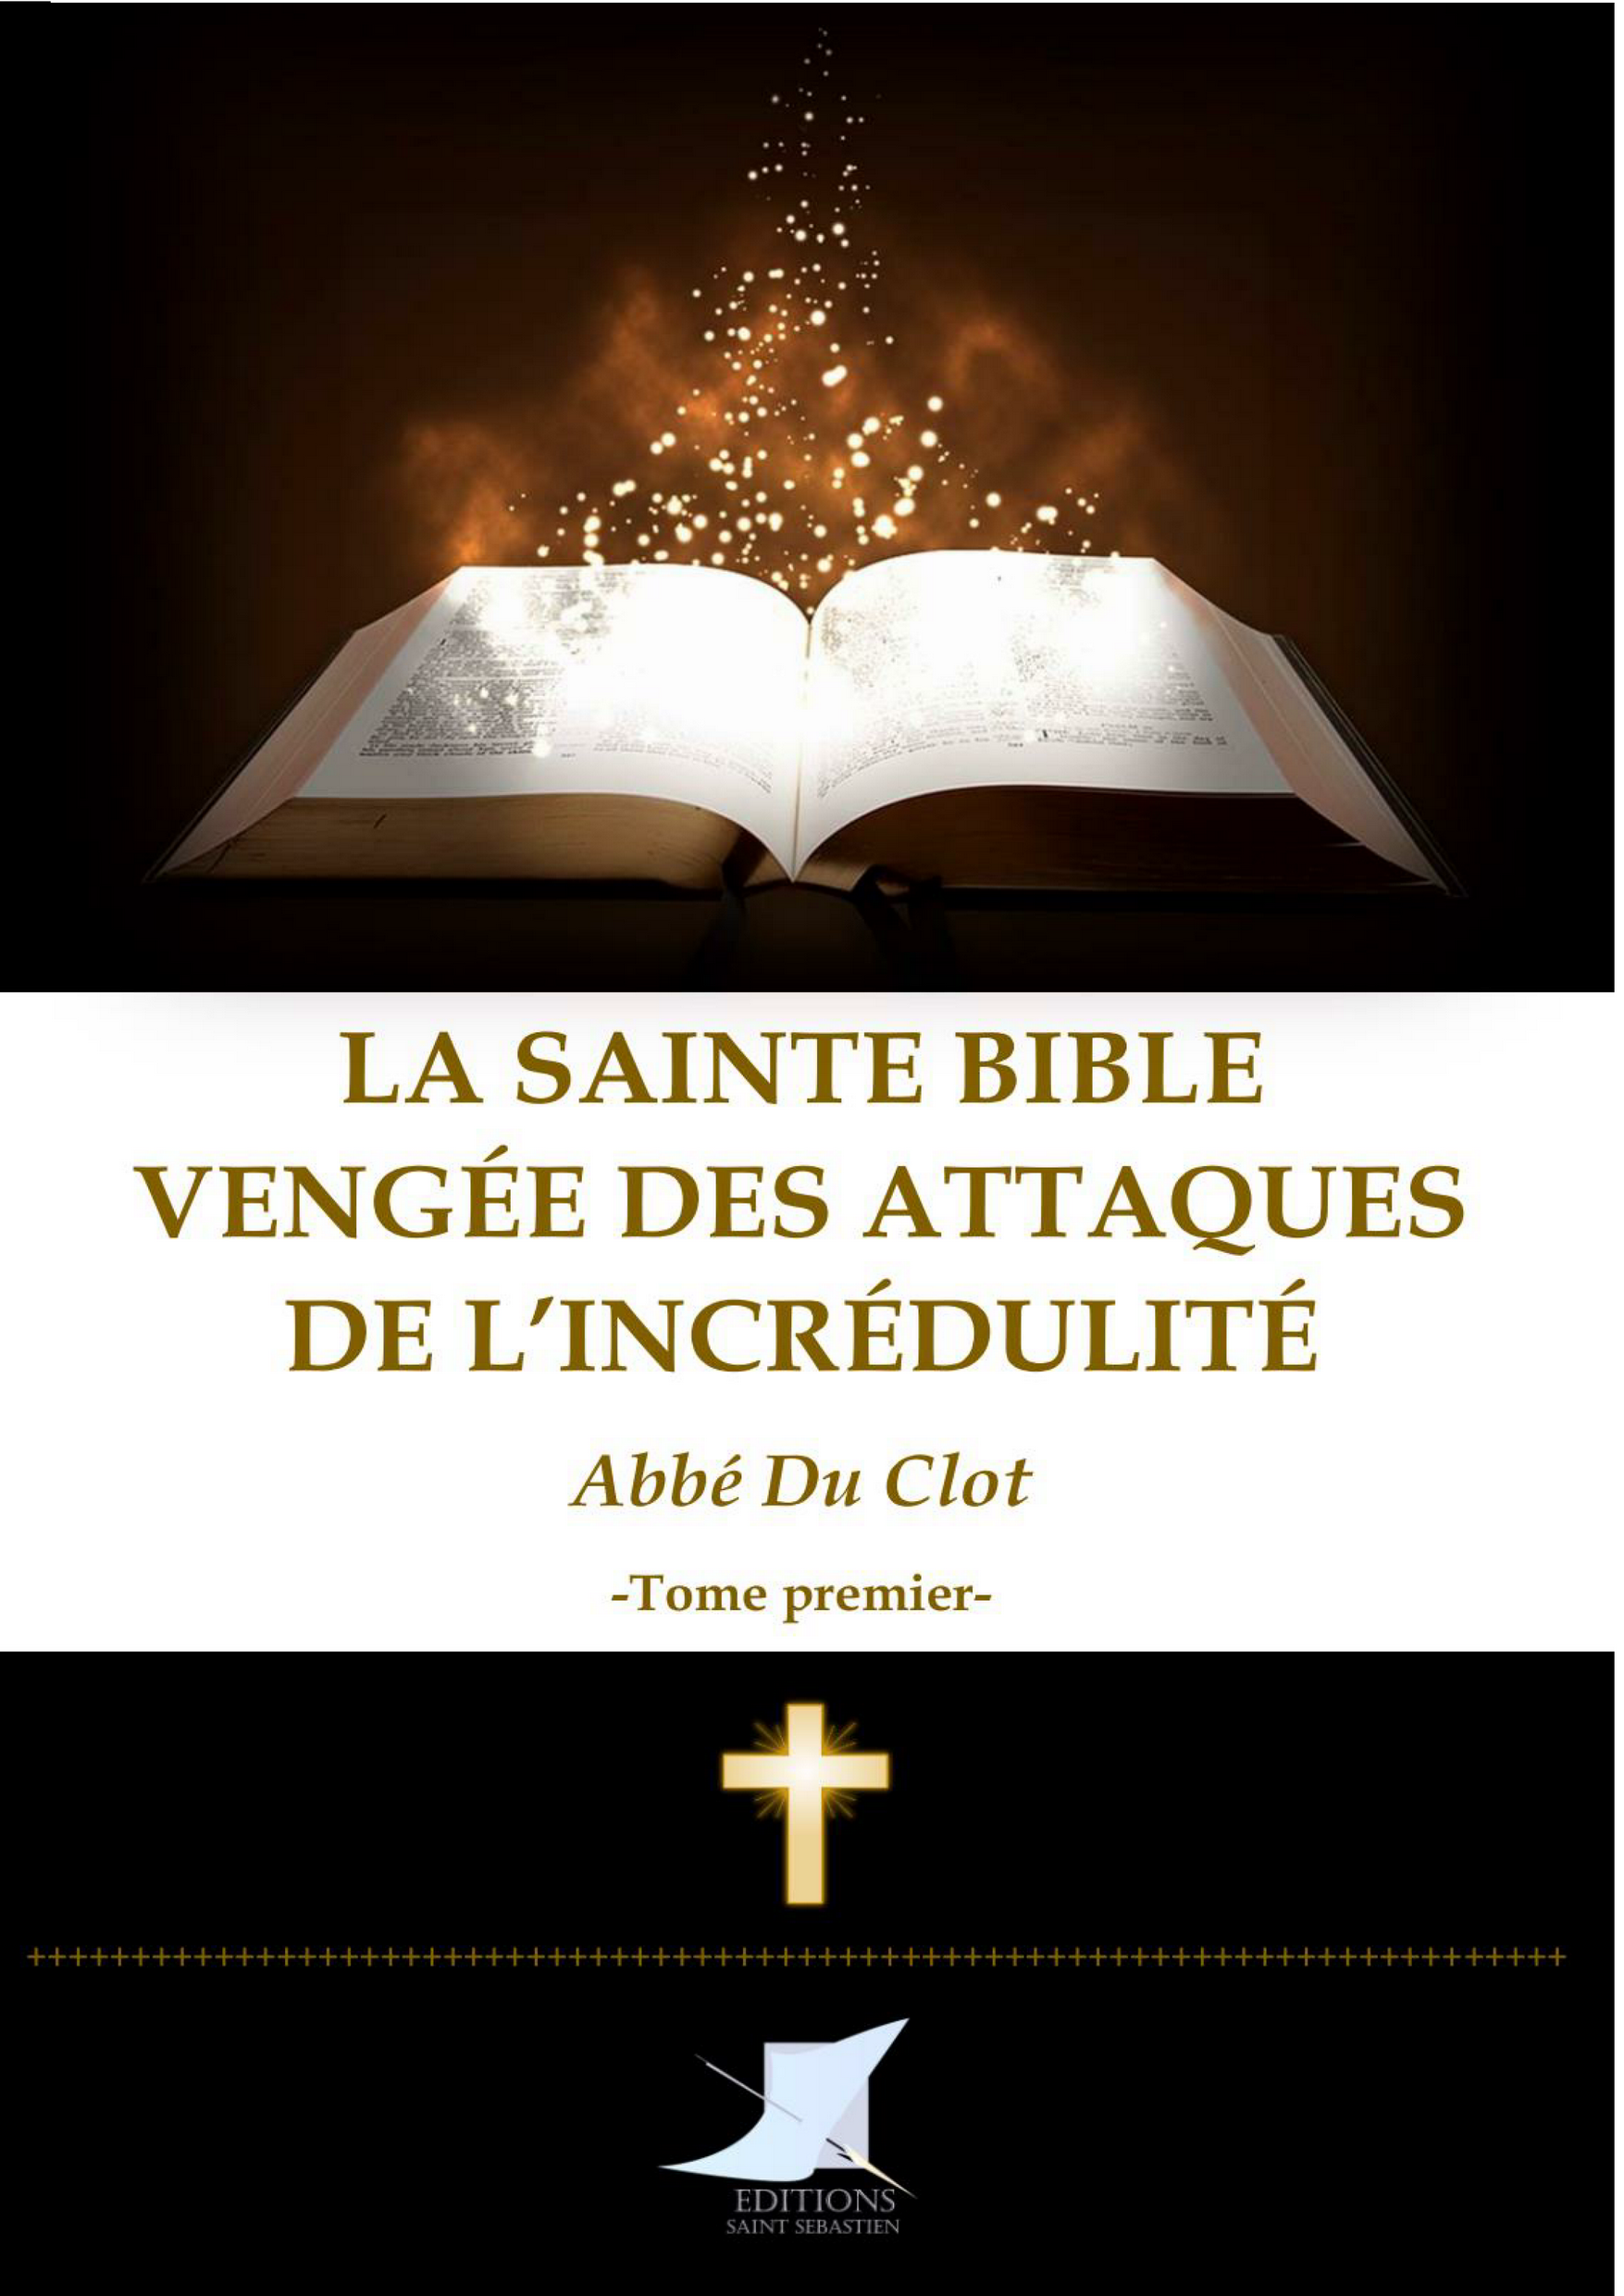 La Sainte Bible vengée (Tome premier)